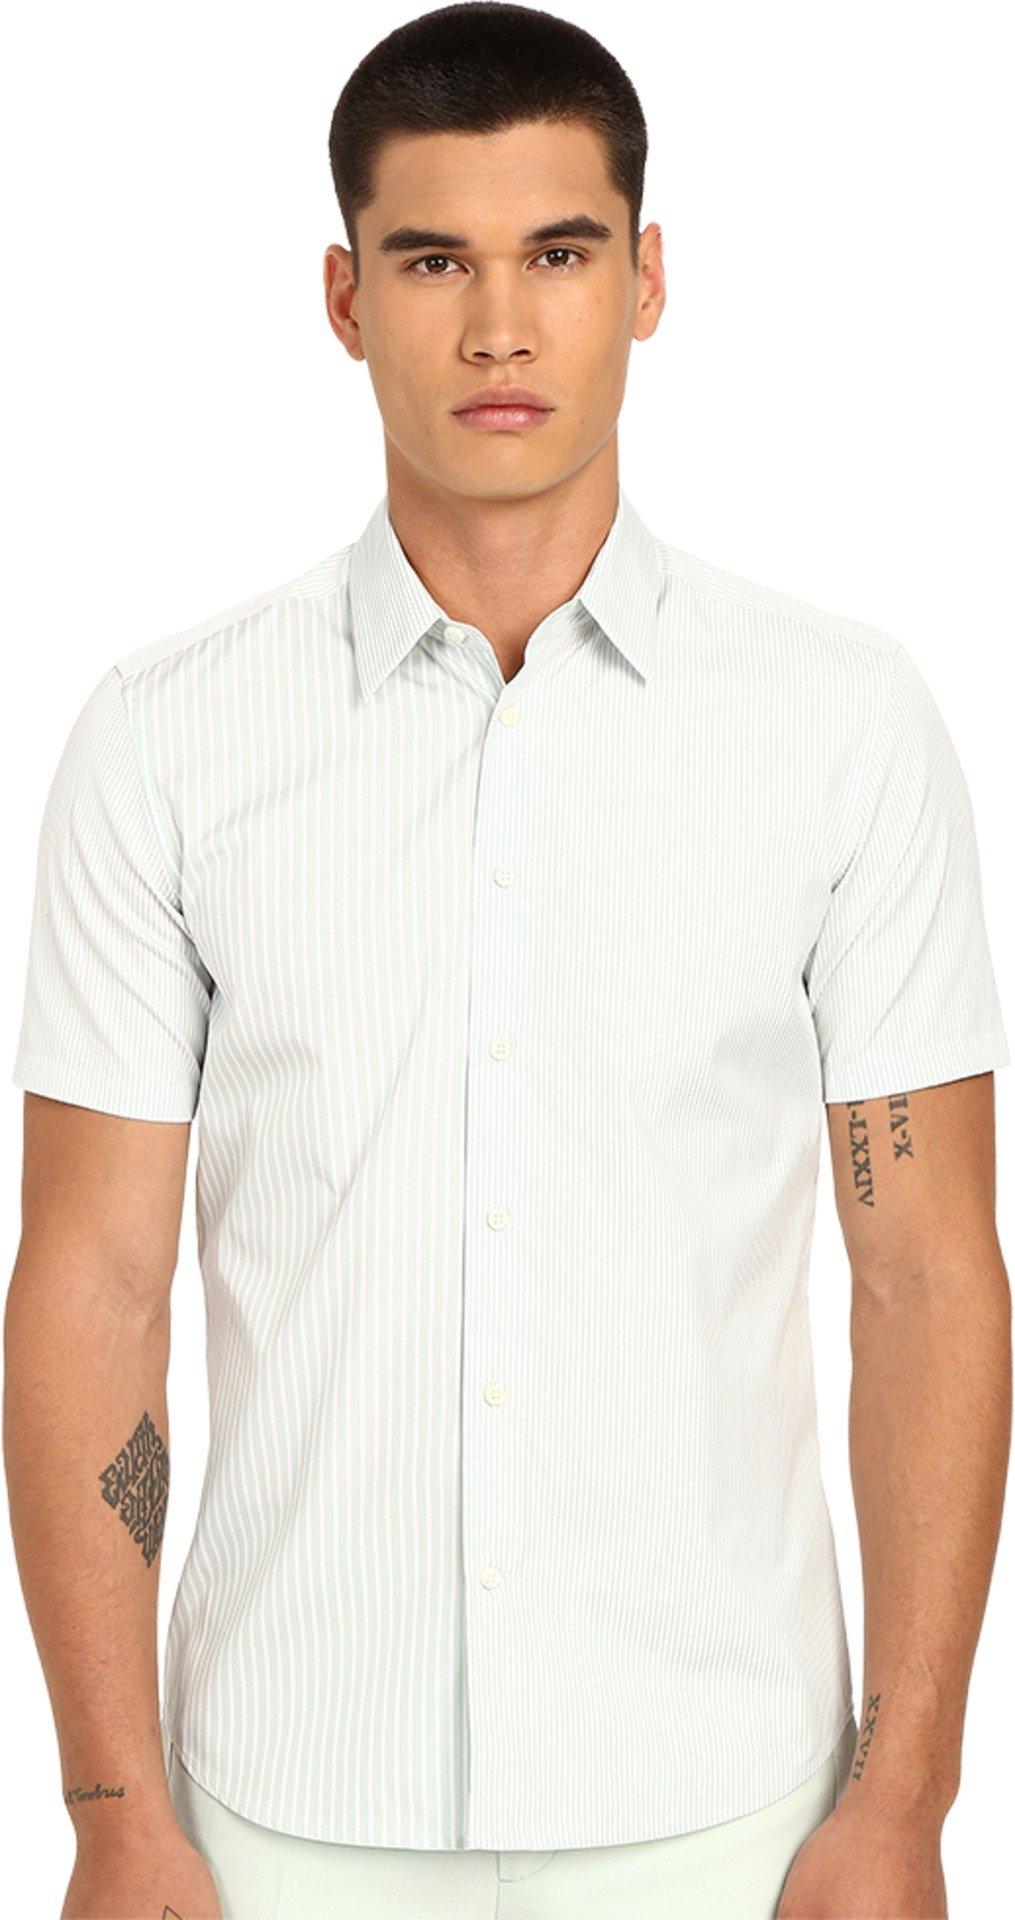 Marc Jacobs Men's Summer Stripe Slim Short Sleeve Button Up Mint Stripe 54 (US 44)